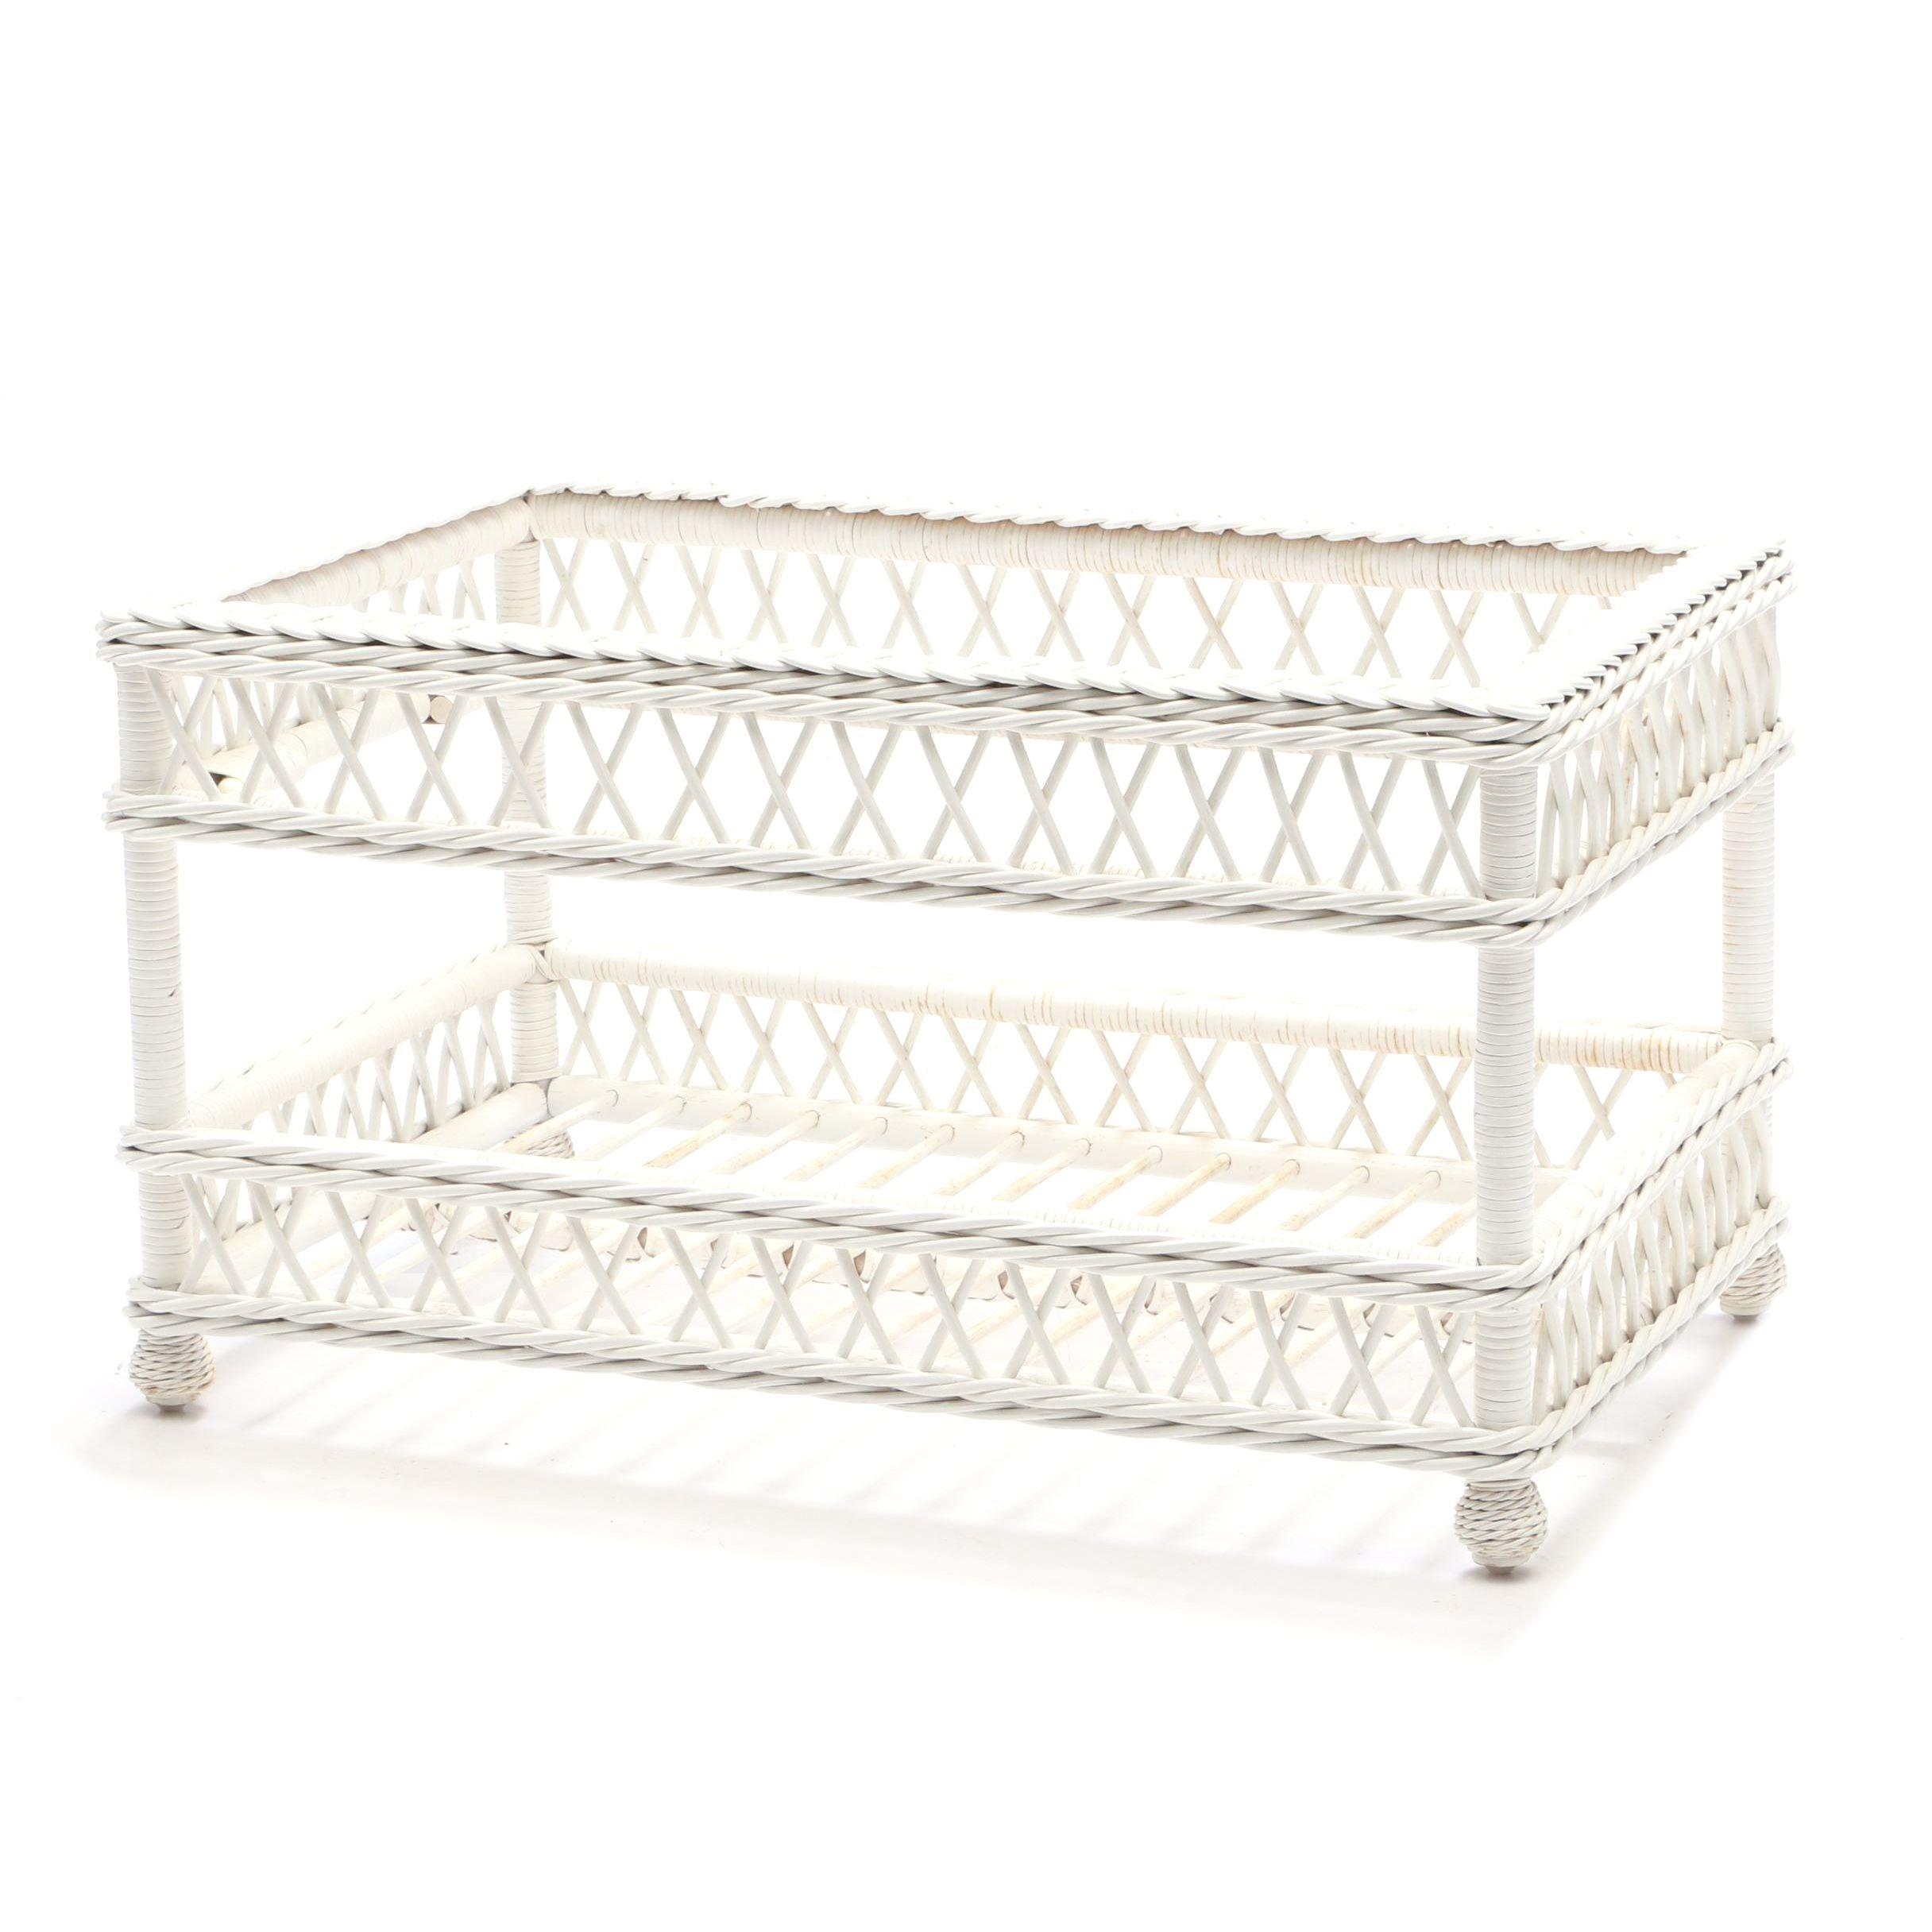 Woven Wicker Bench in White